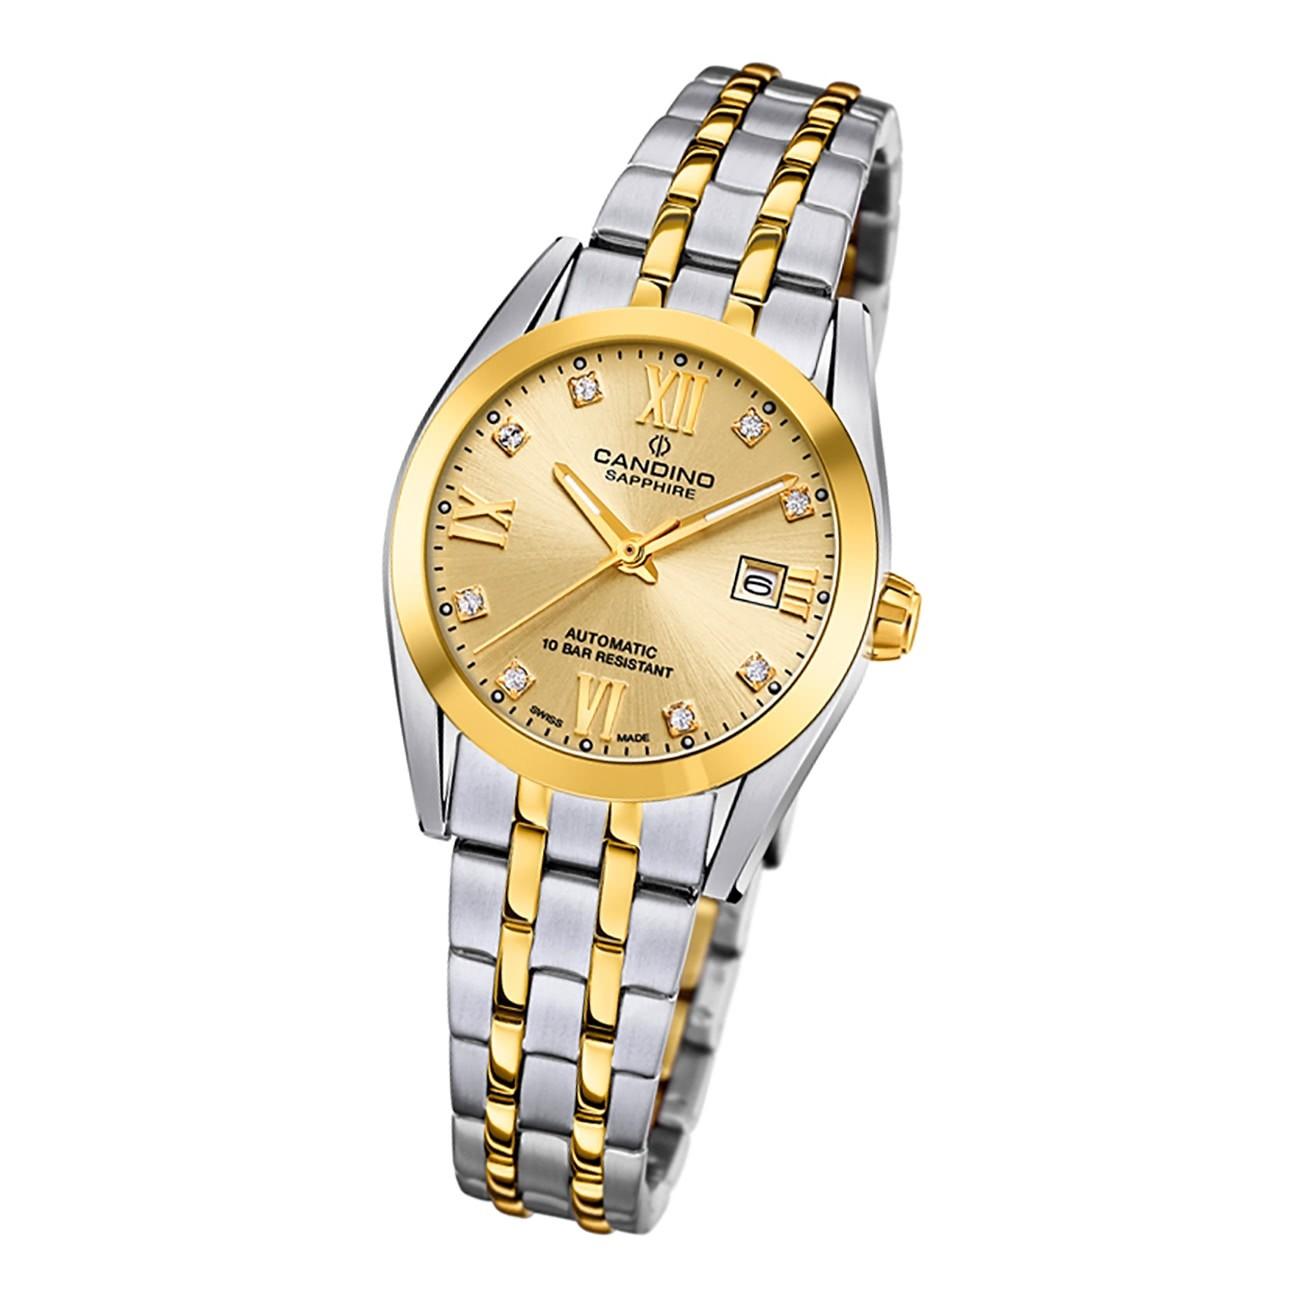 Candino Damen Armbanduhr Automatik C4704/3 Analog Edelstahl silber gold UC4704/3